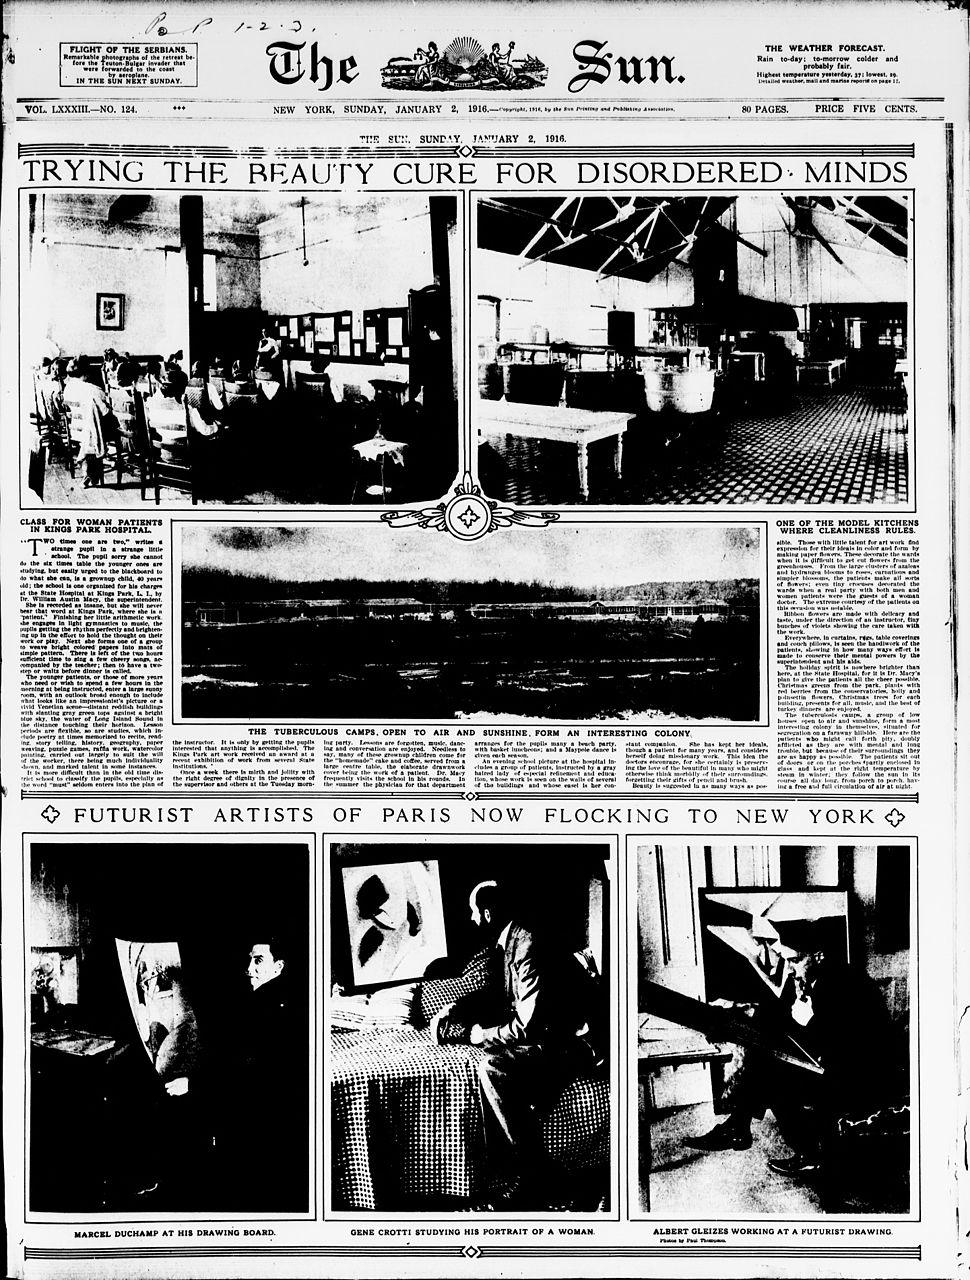 Albert Gleizes, Jean Crotti, Marcel Duchamp, The Sun, New York, 2 January 1916